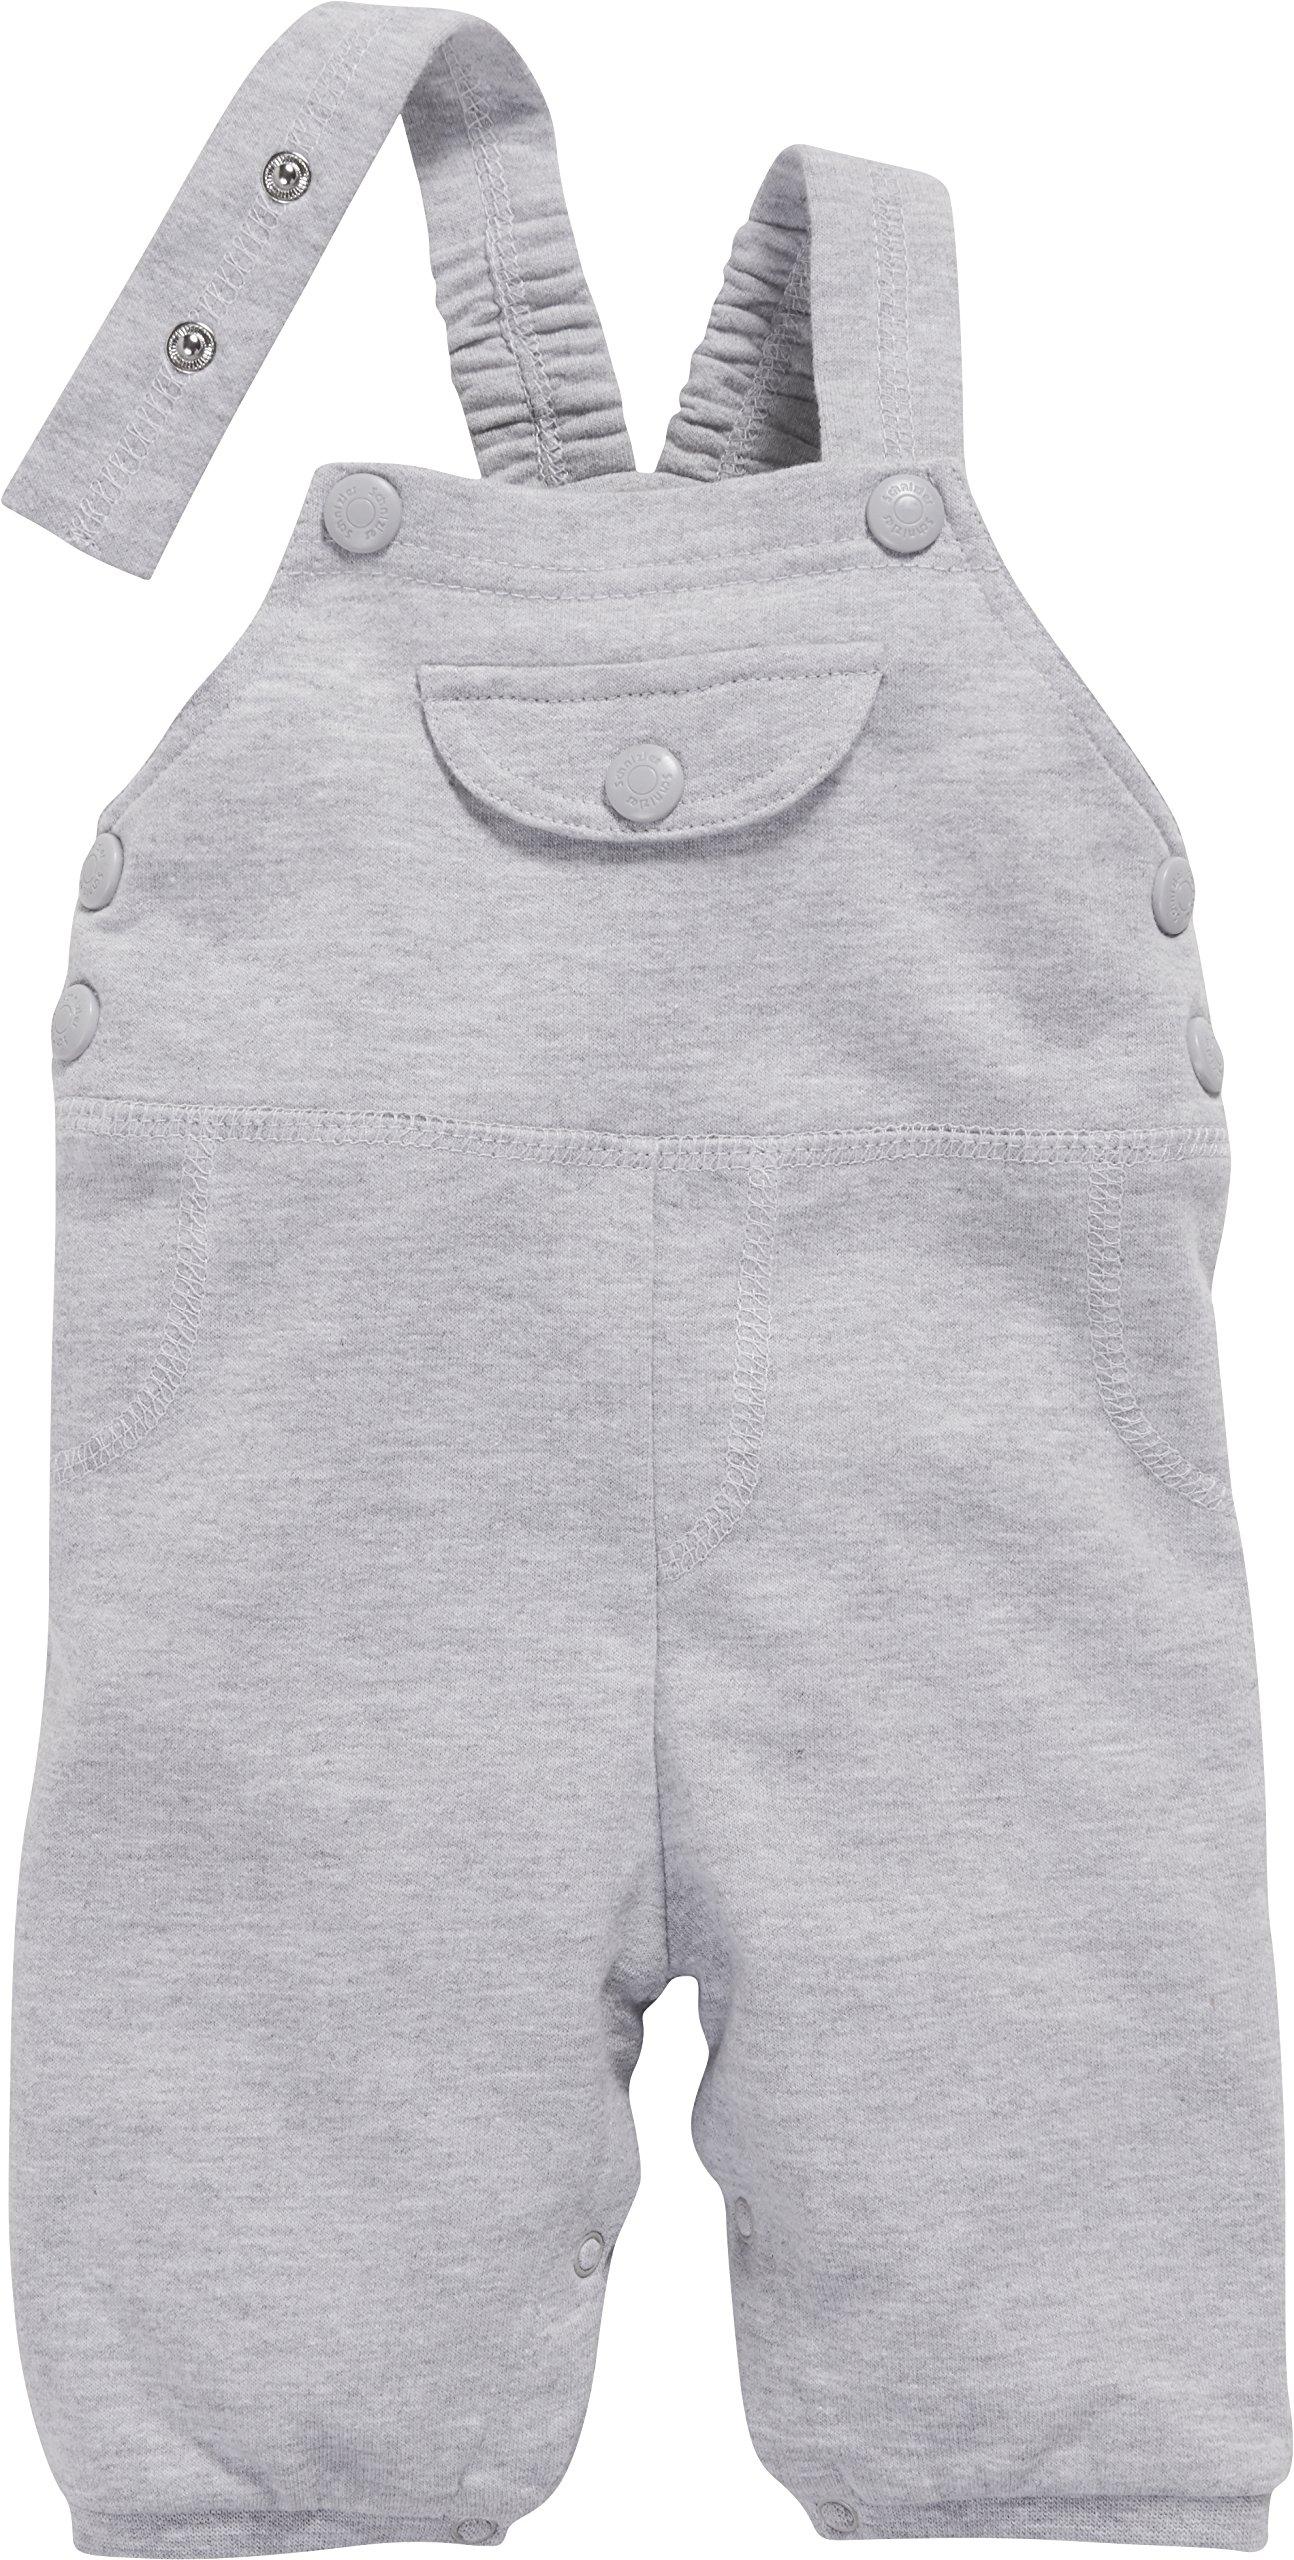 Schnizler Baby Sweat-Latzhose Meliert Pantalones de Peto para Bebés 2